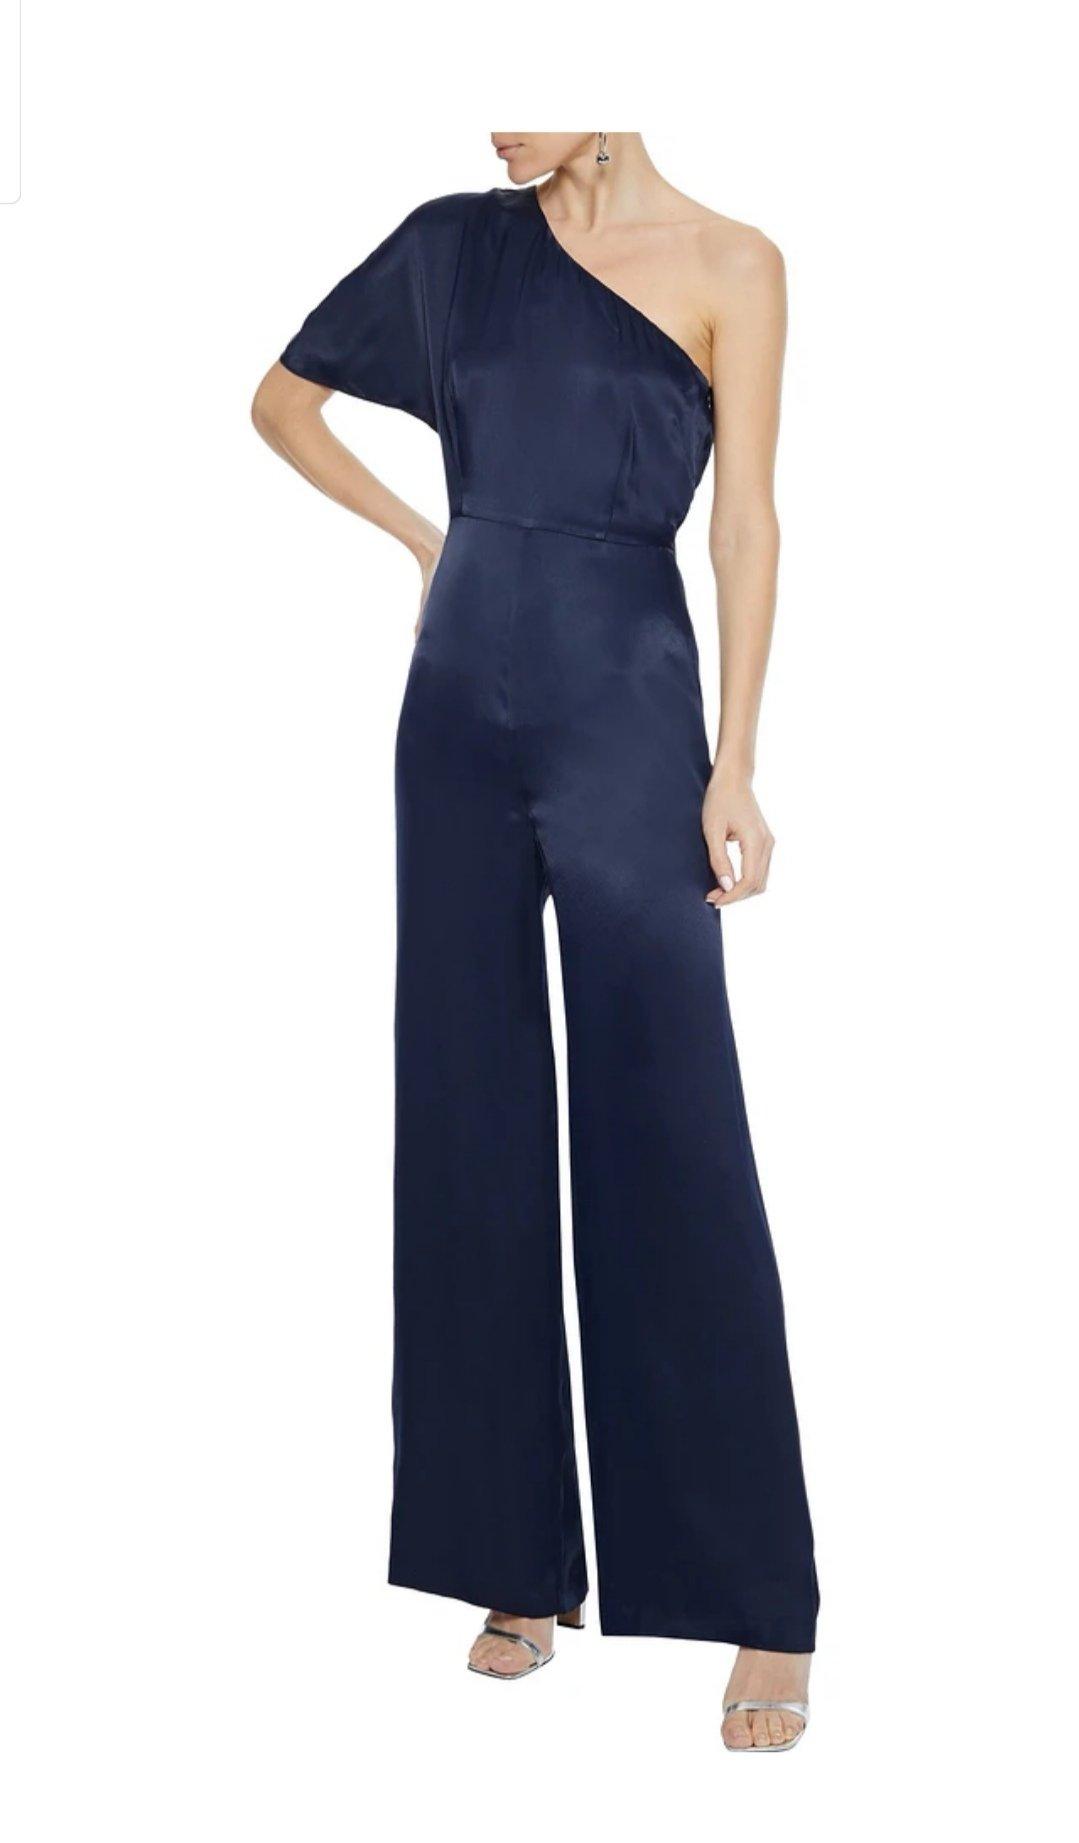 THE OUTNET上买的连体裤,完美上身!